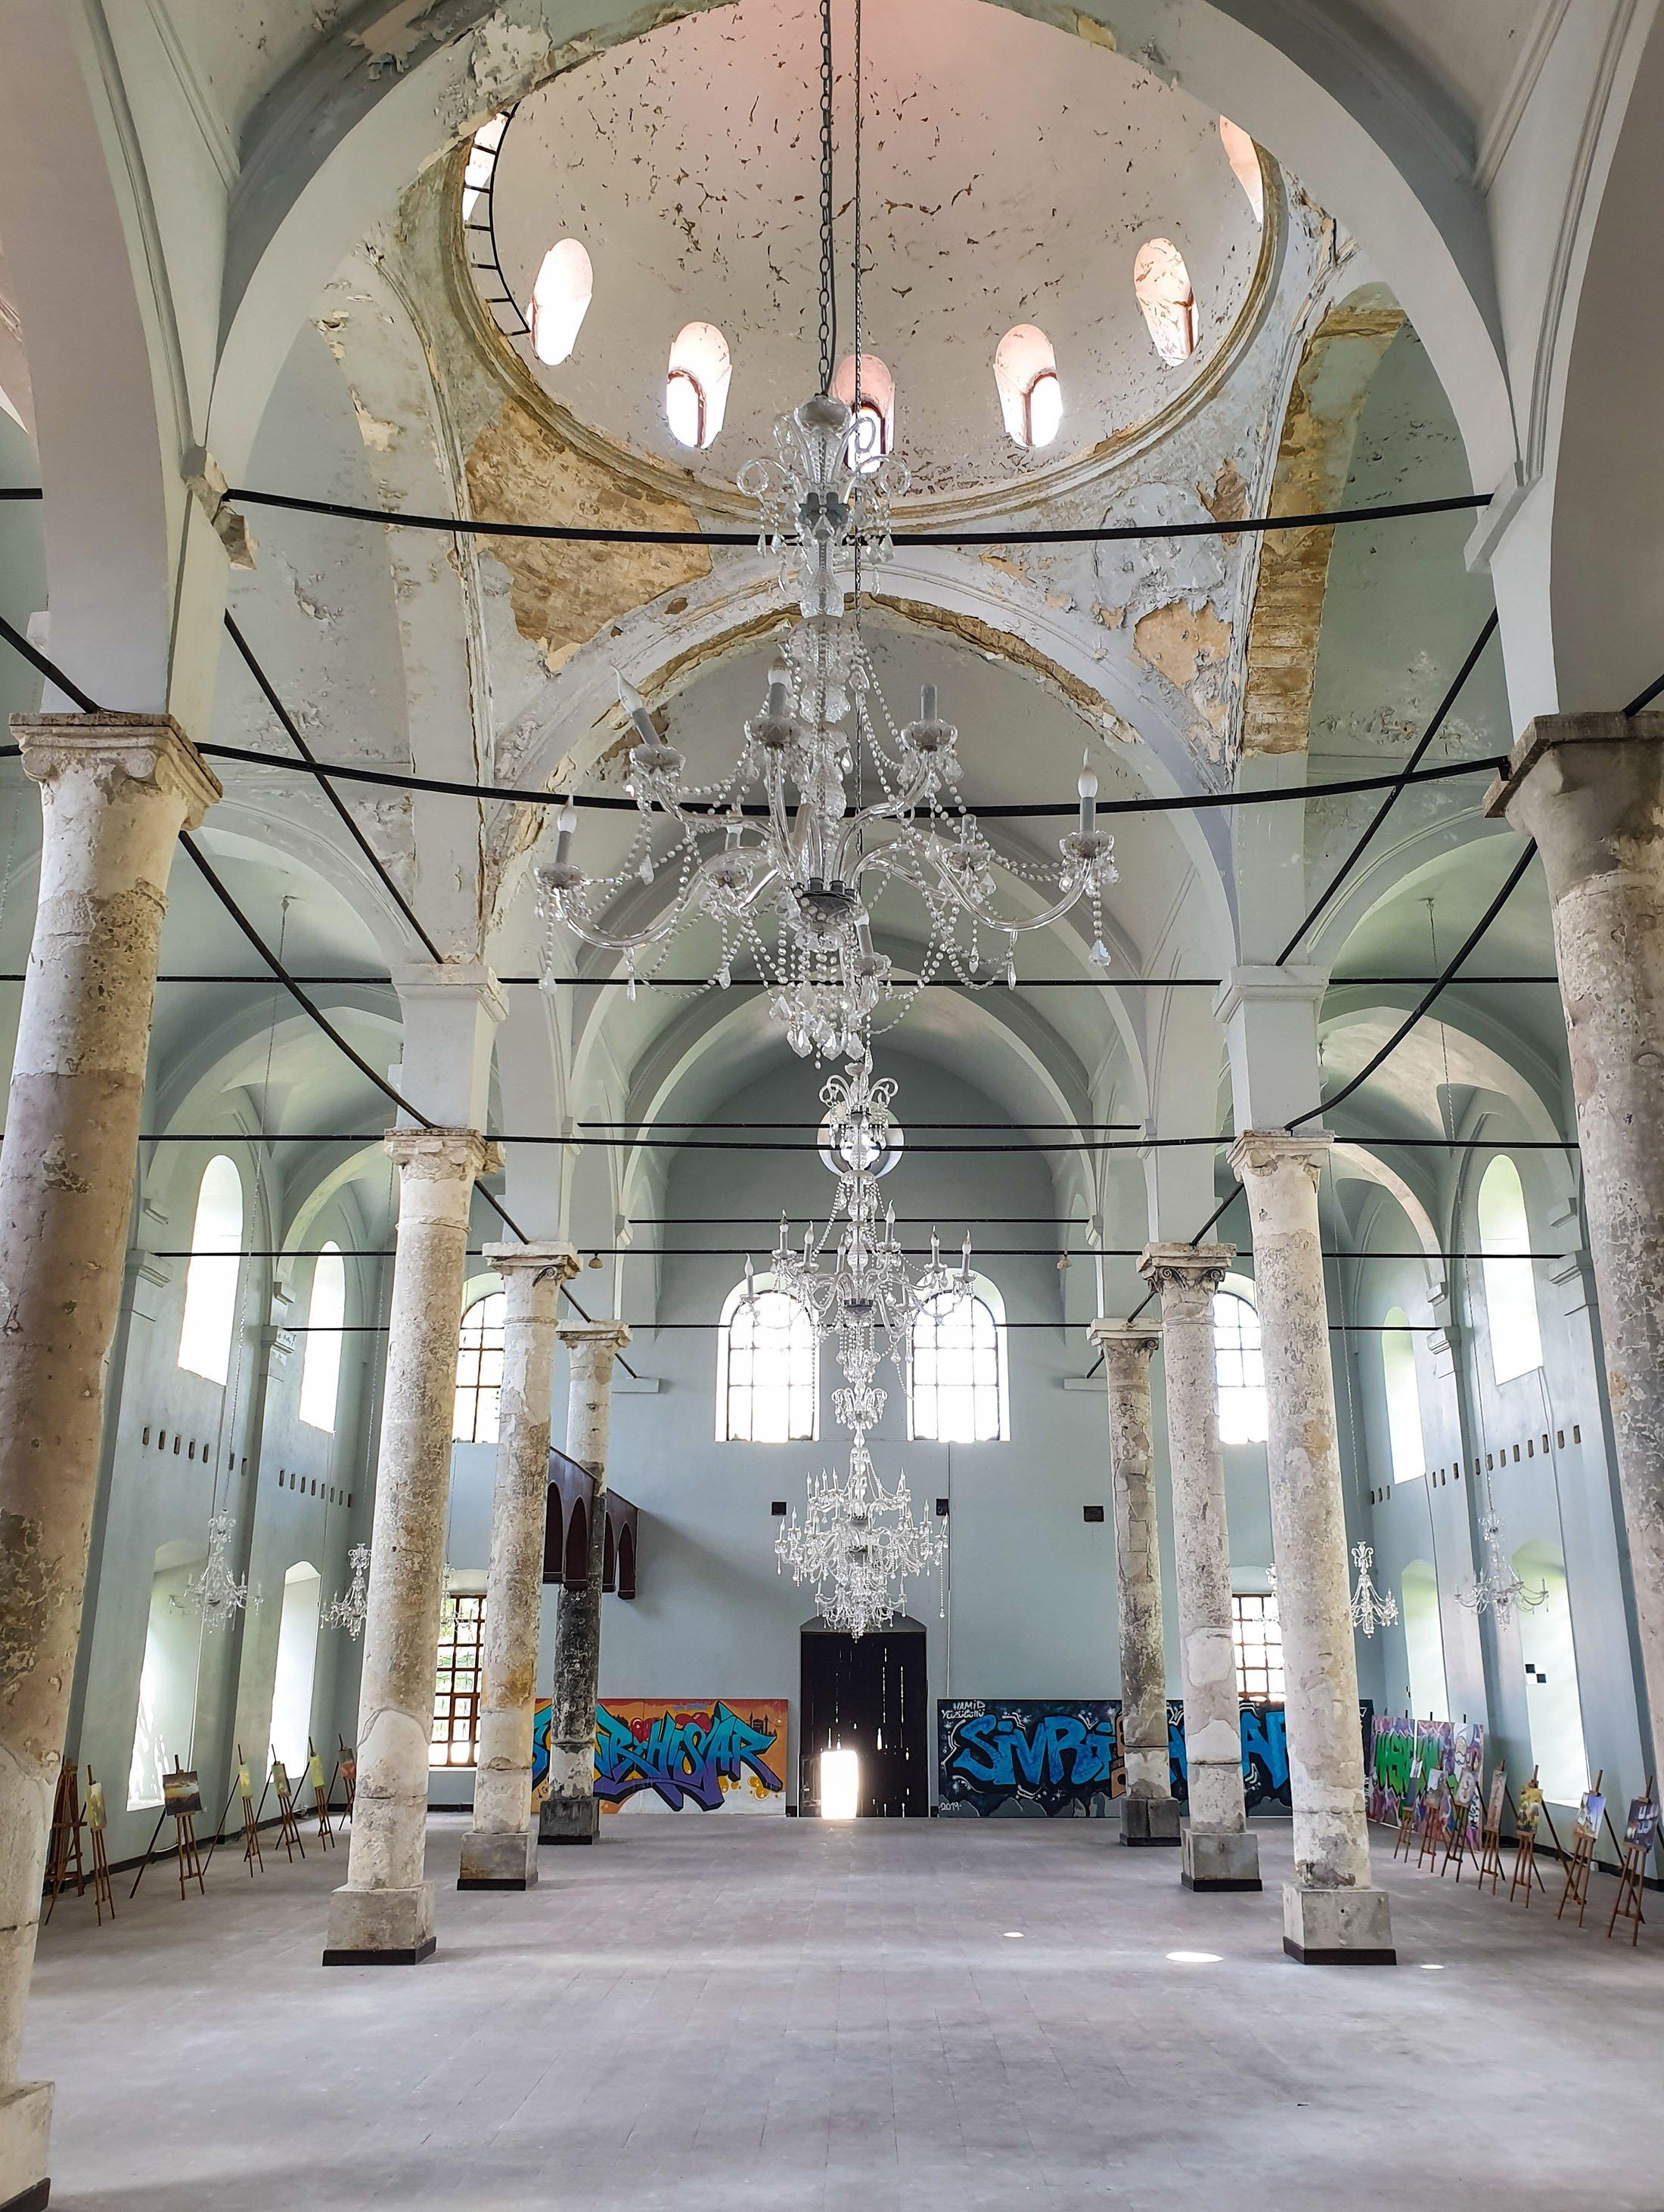 The interior of the Sivrihisar Armenian Church, Sivrihisar, Eskişehir, central Turkey.  (Photo by Argun Konuk)